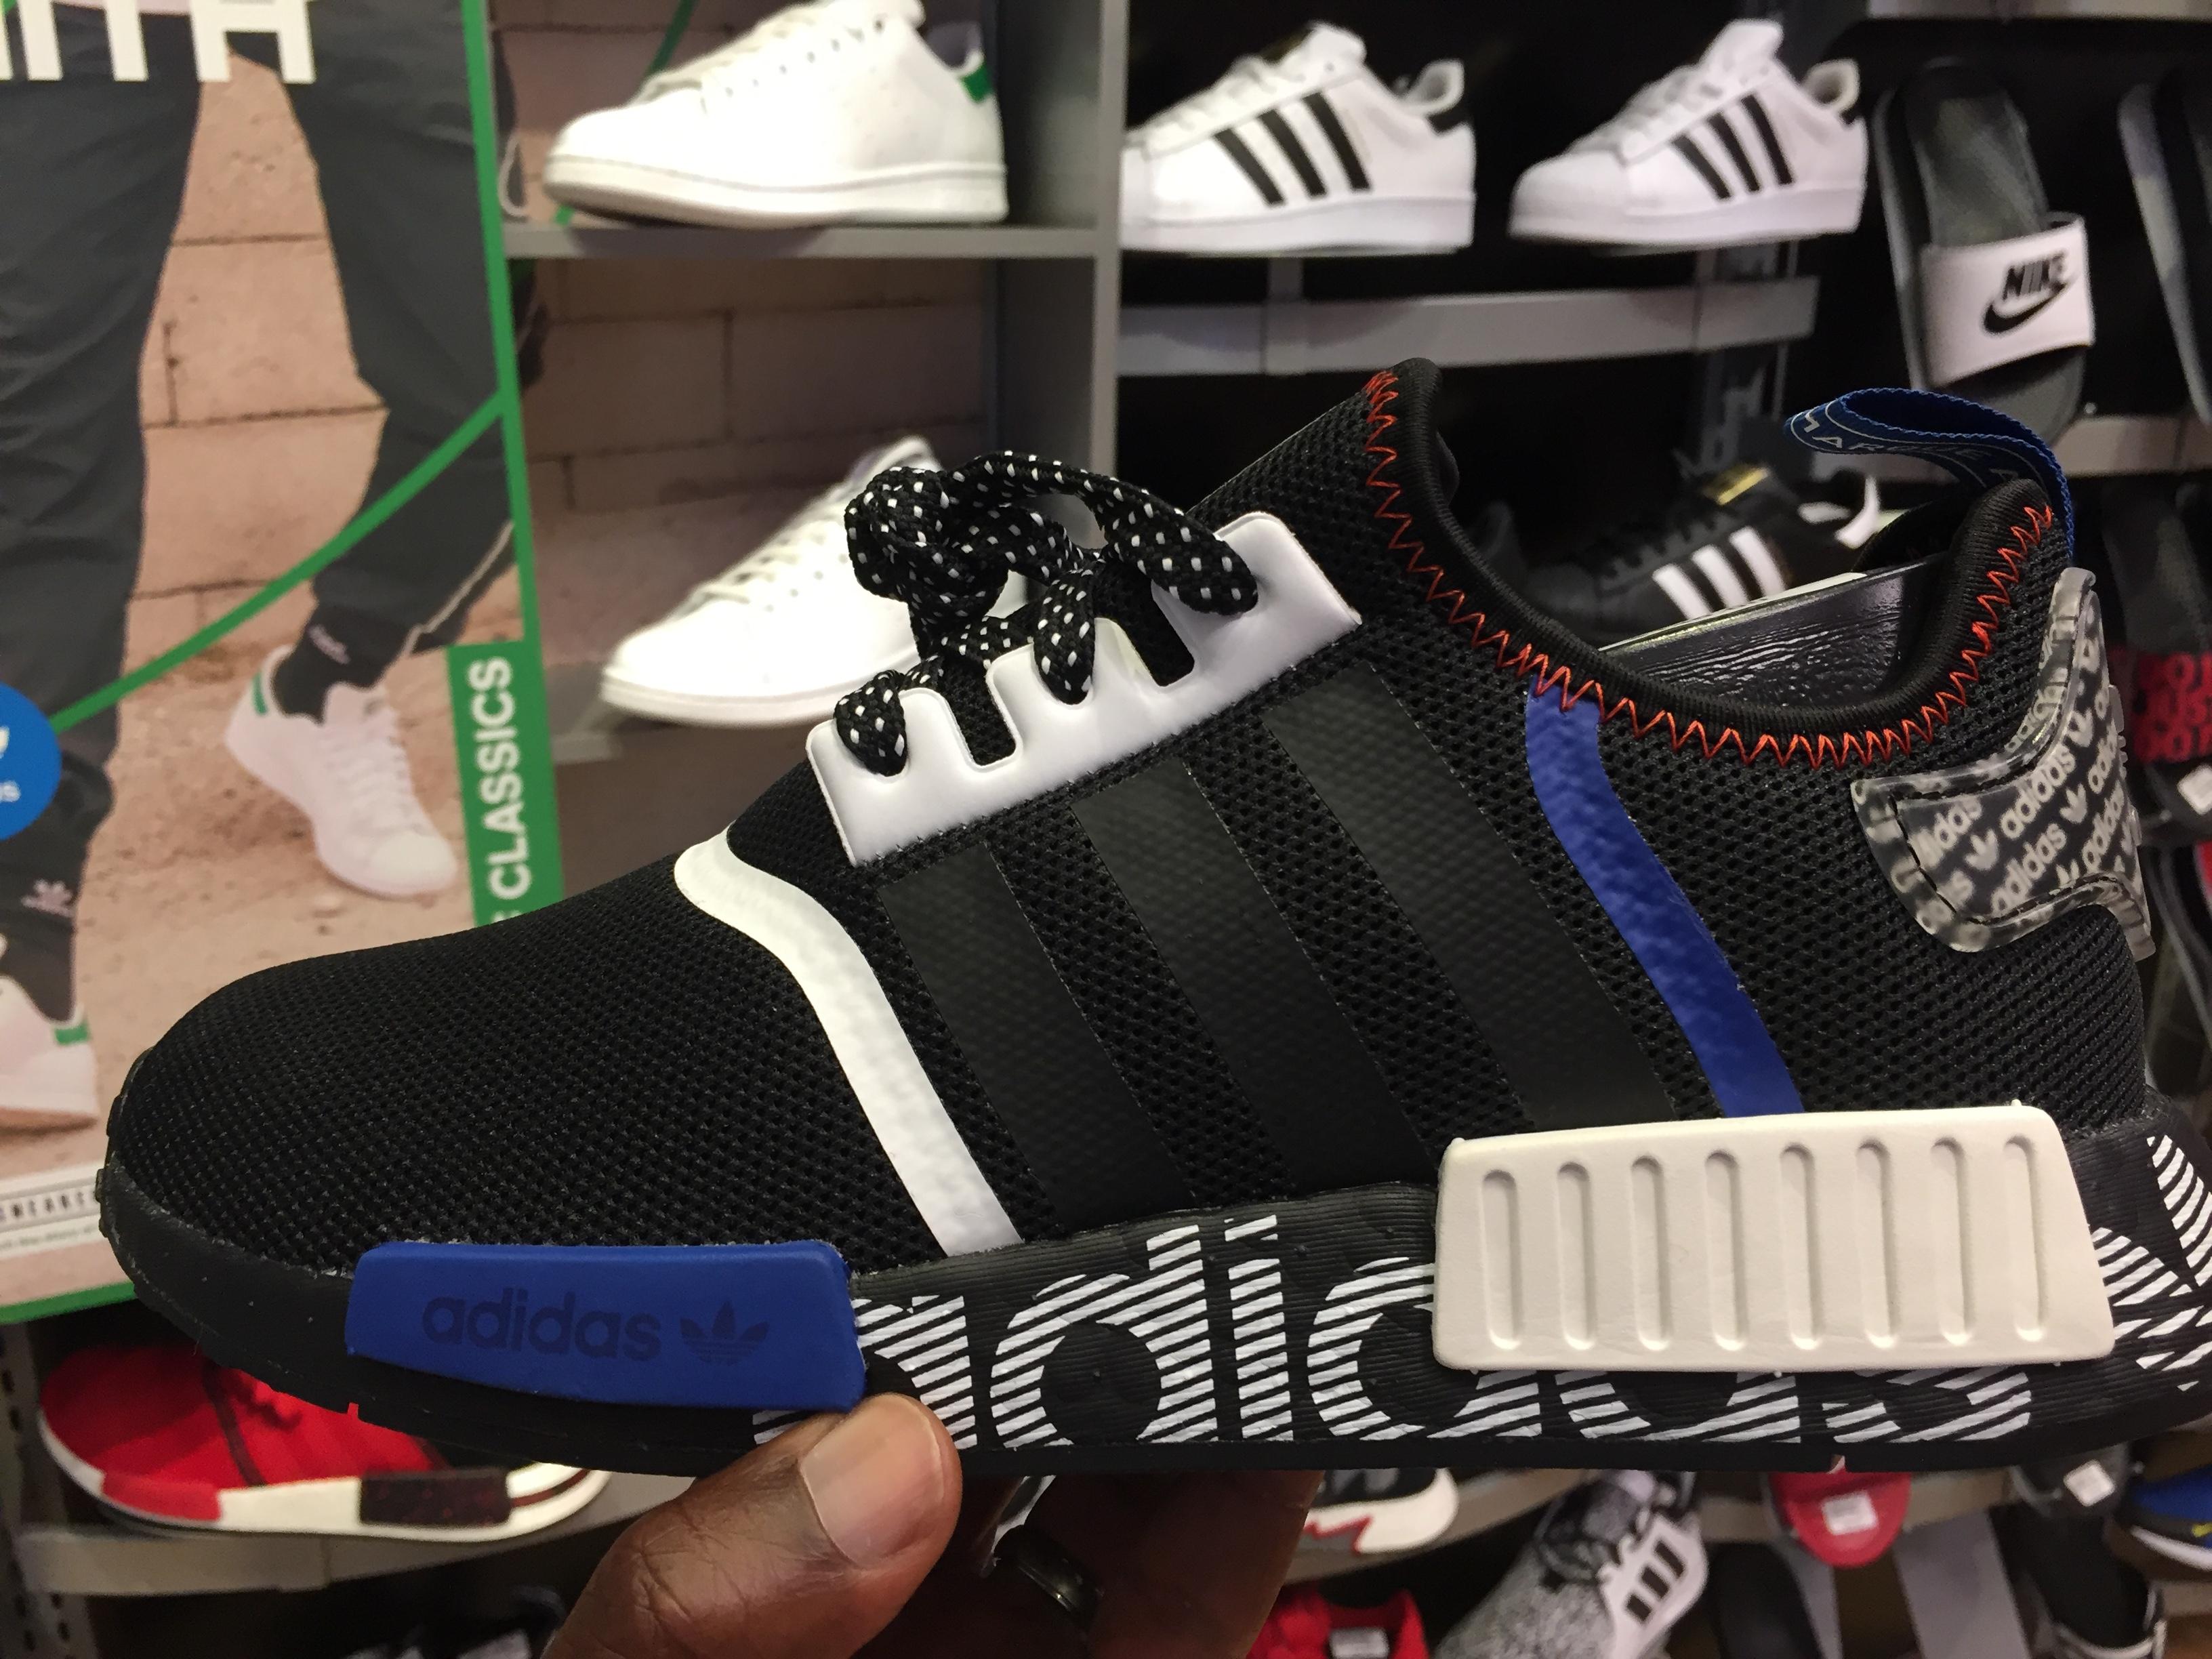 Adidas NMD R1 DSTN Black White FV5215